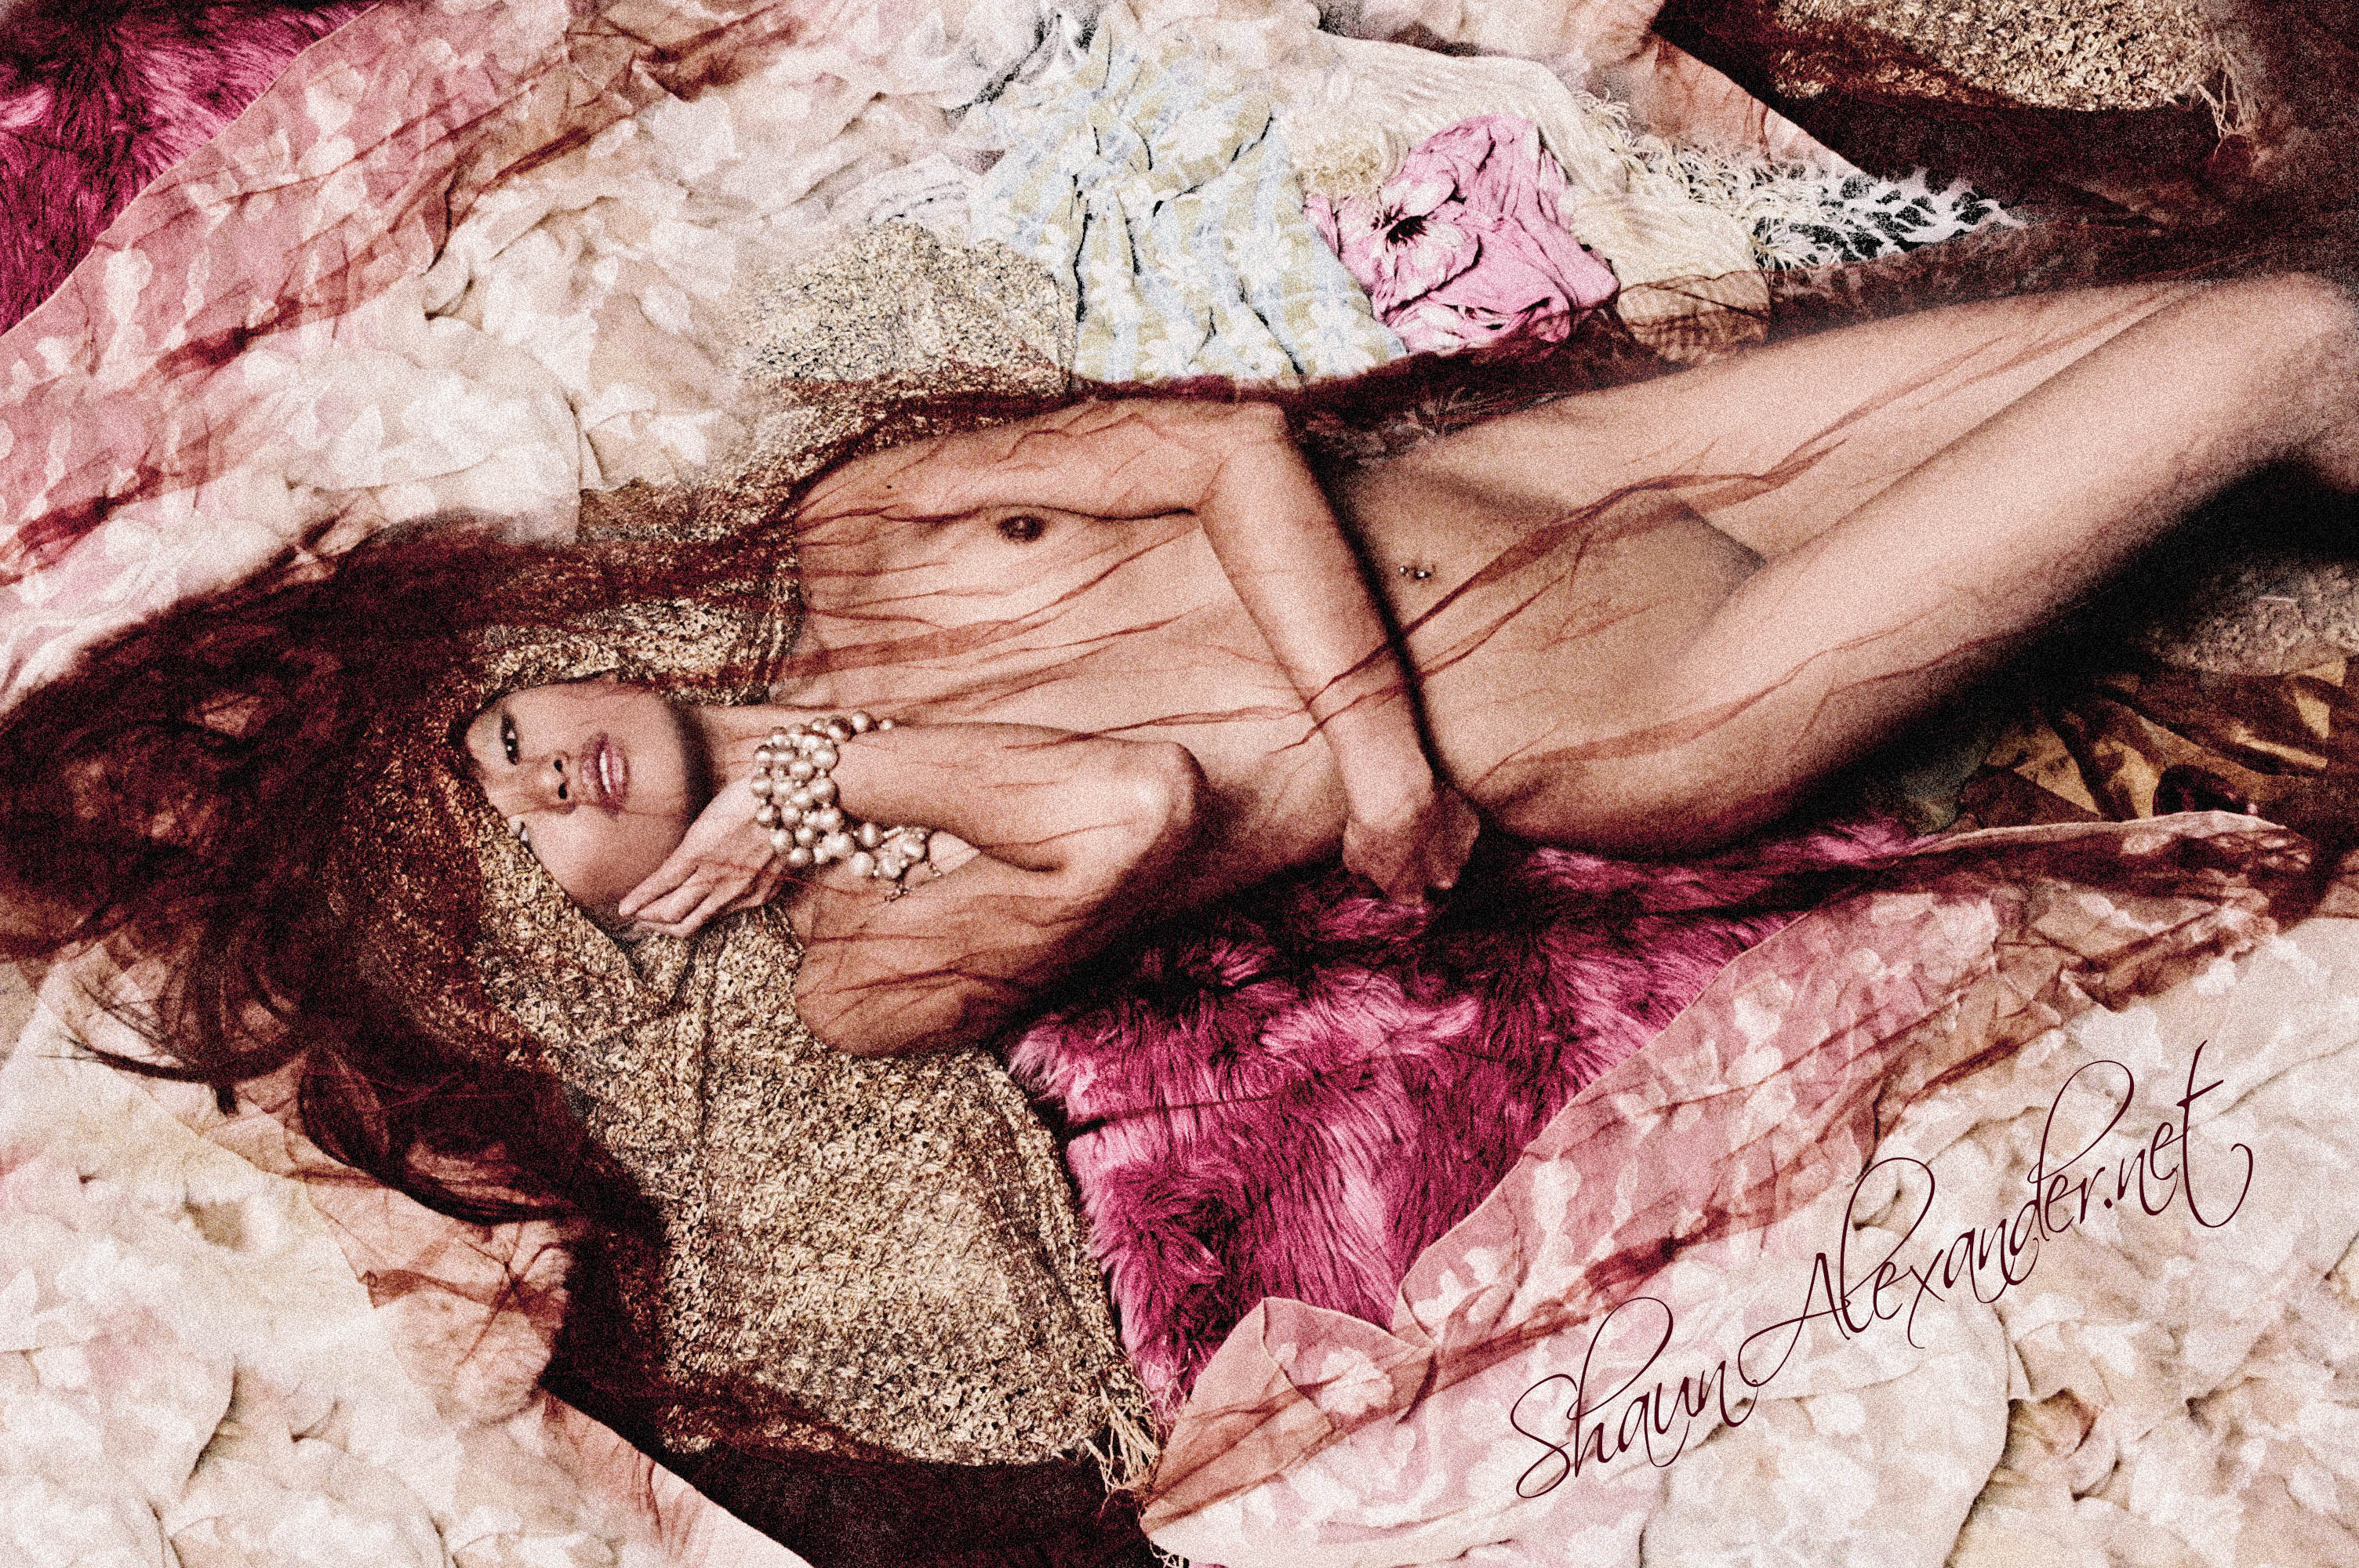 Artistic nude photos of Asian model